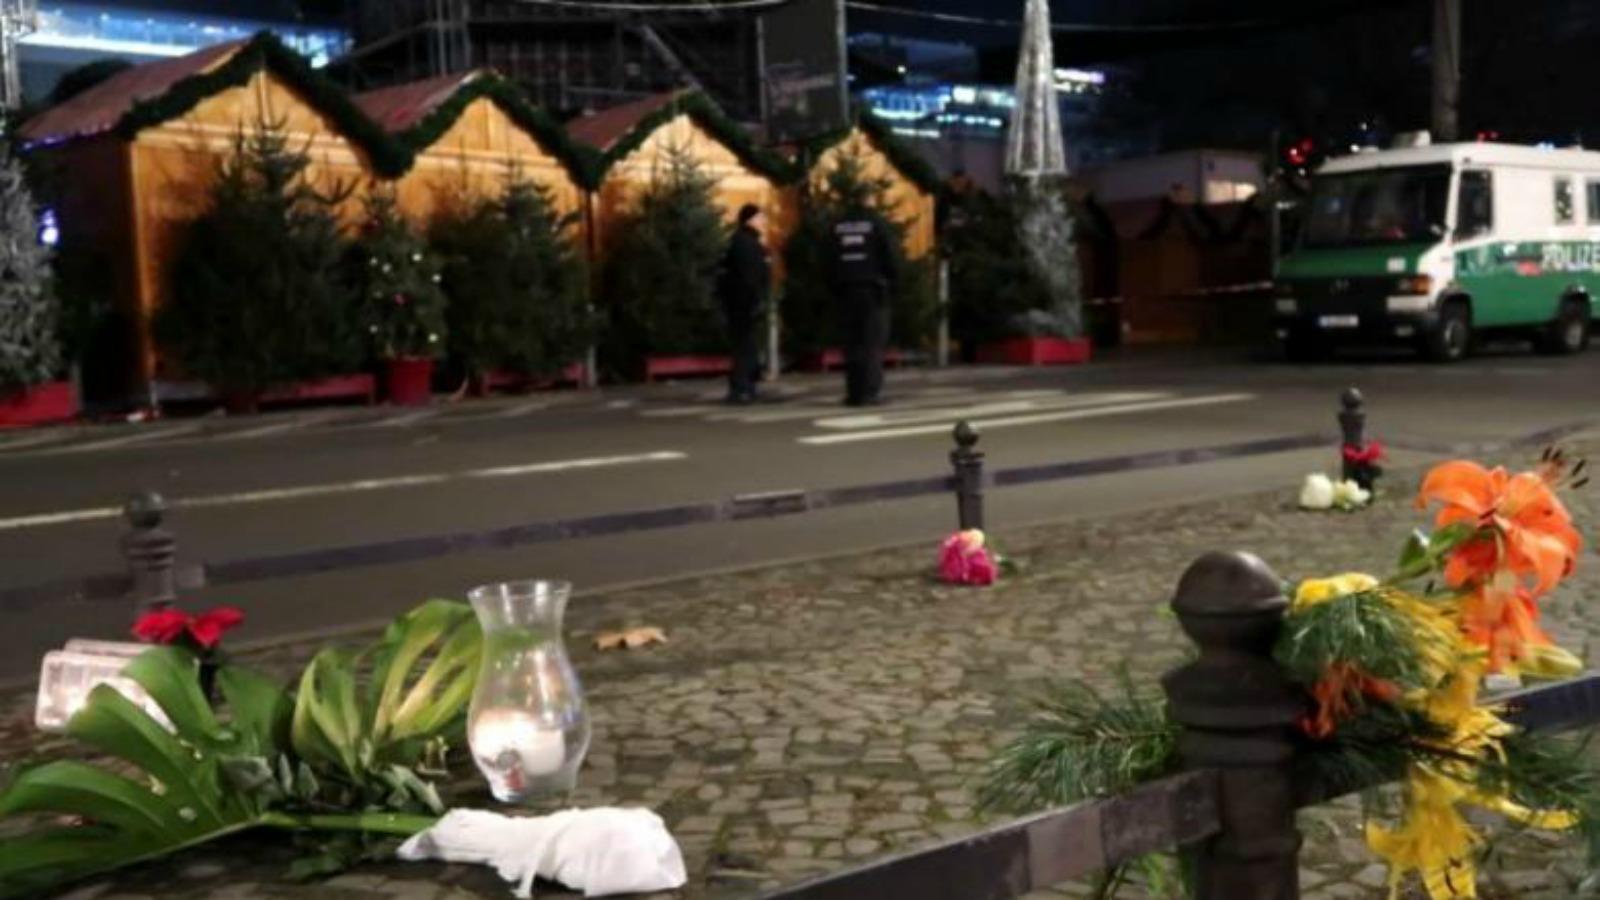 berlin christmas market holidays 2018